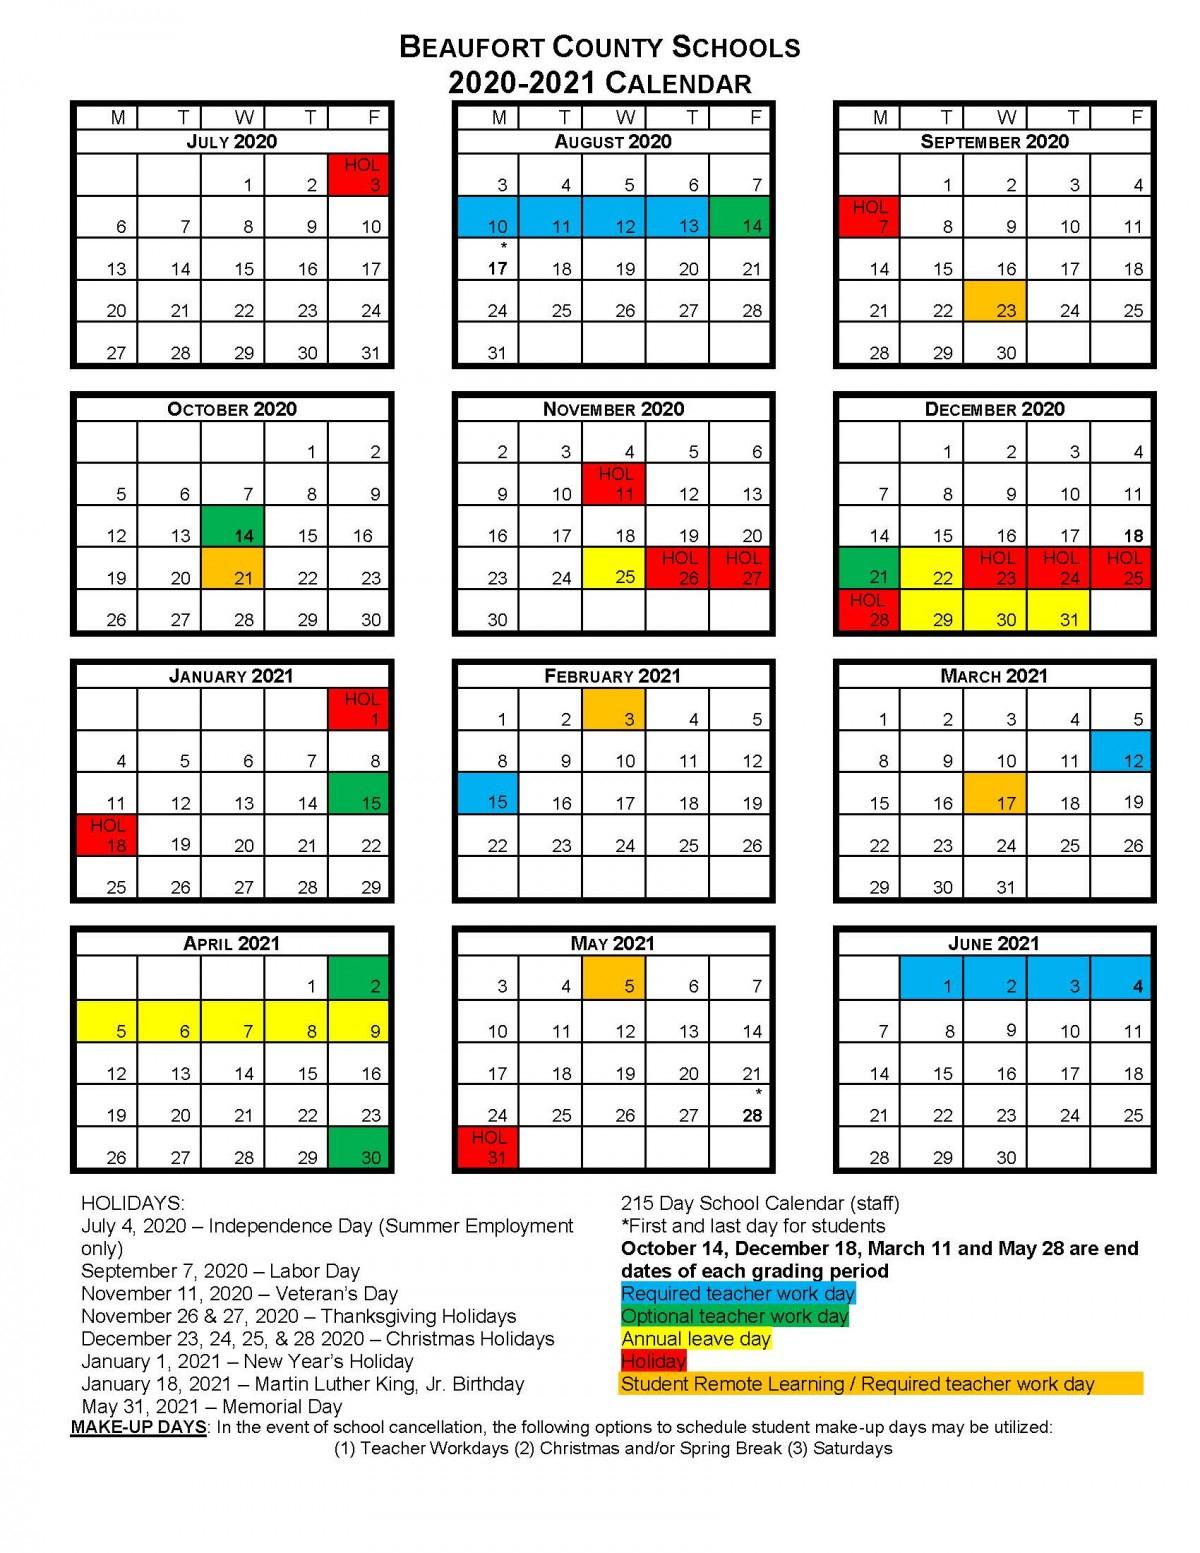 Bcs School Calendars | Beaufort County Schools pertaining to Augusta County School Calendar